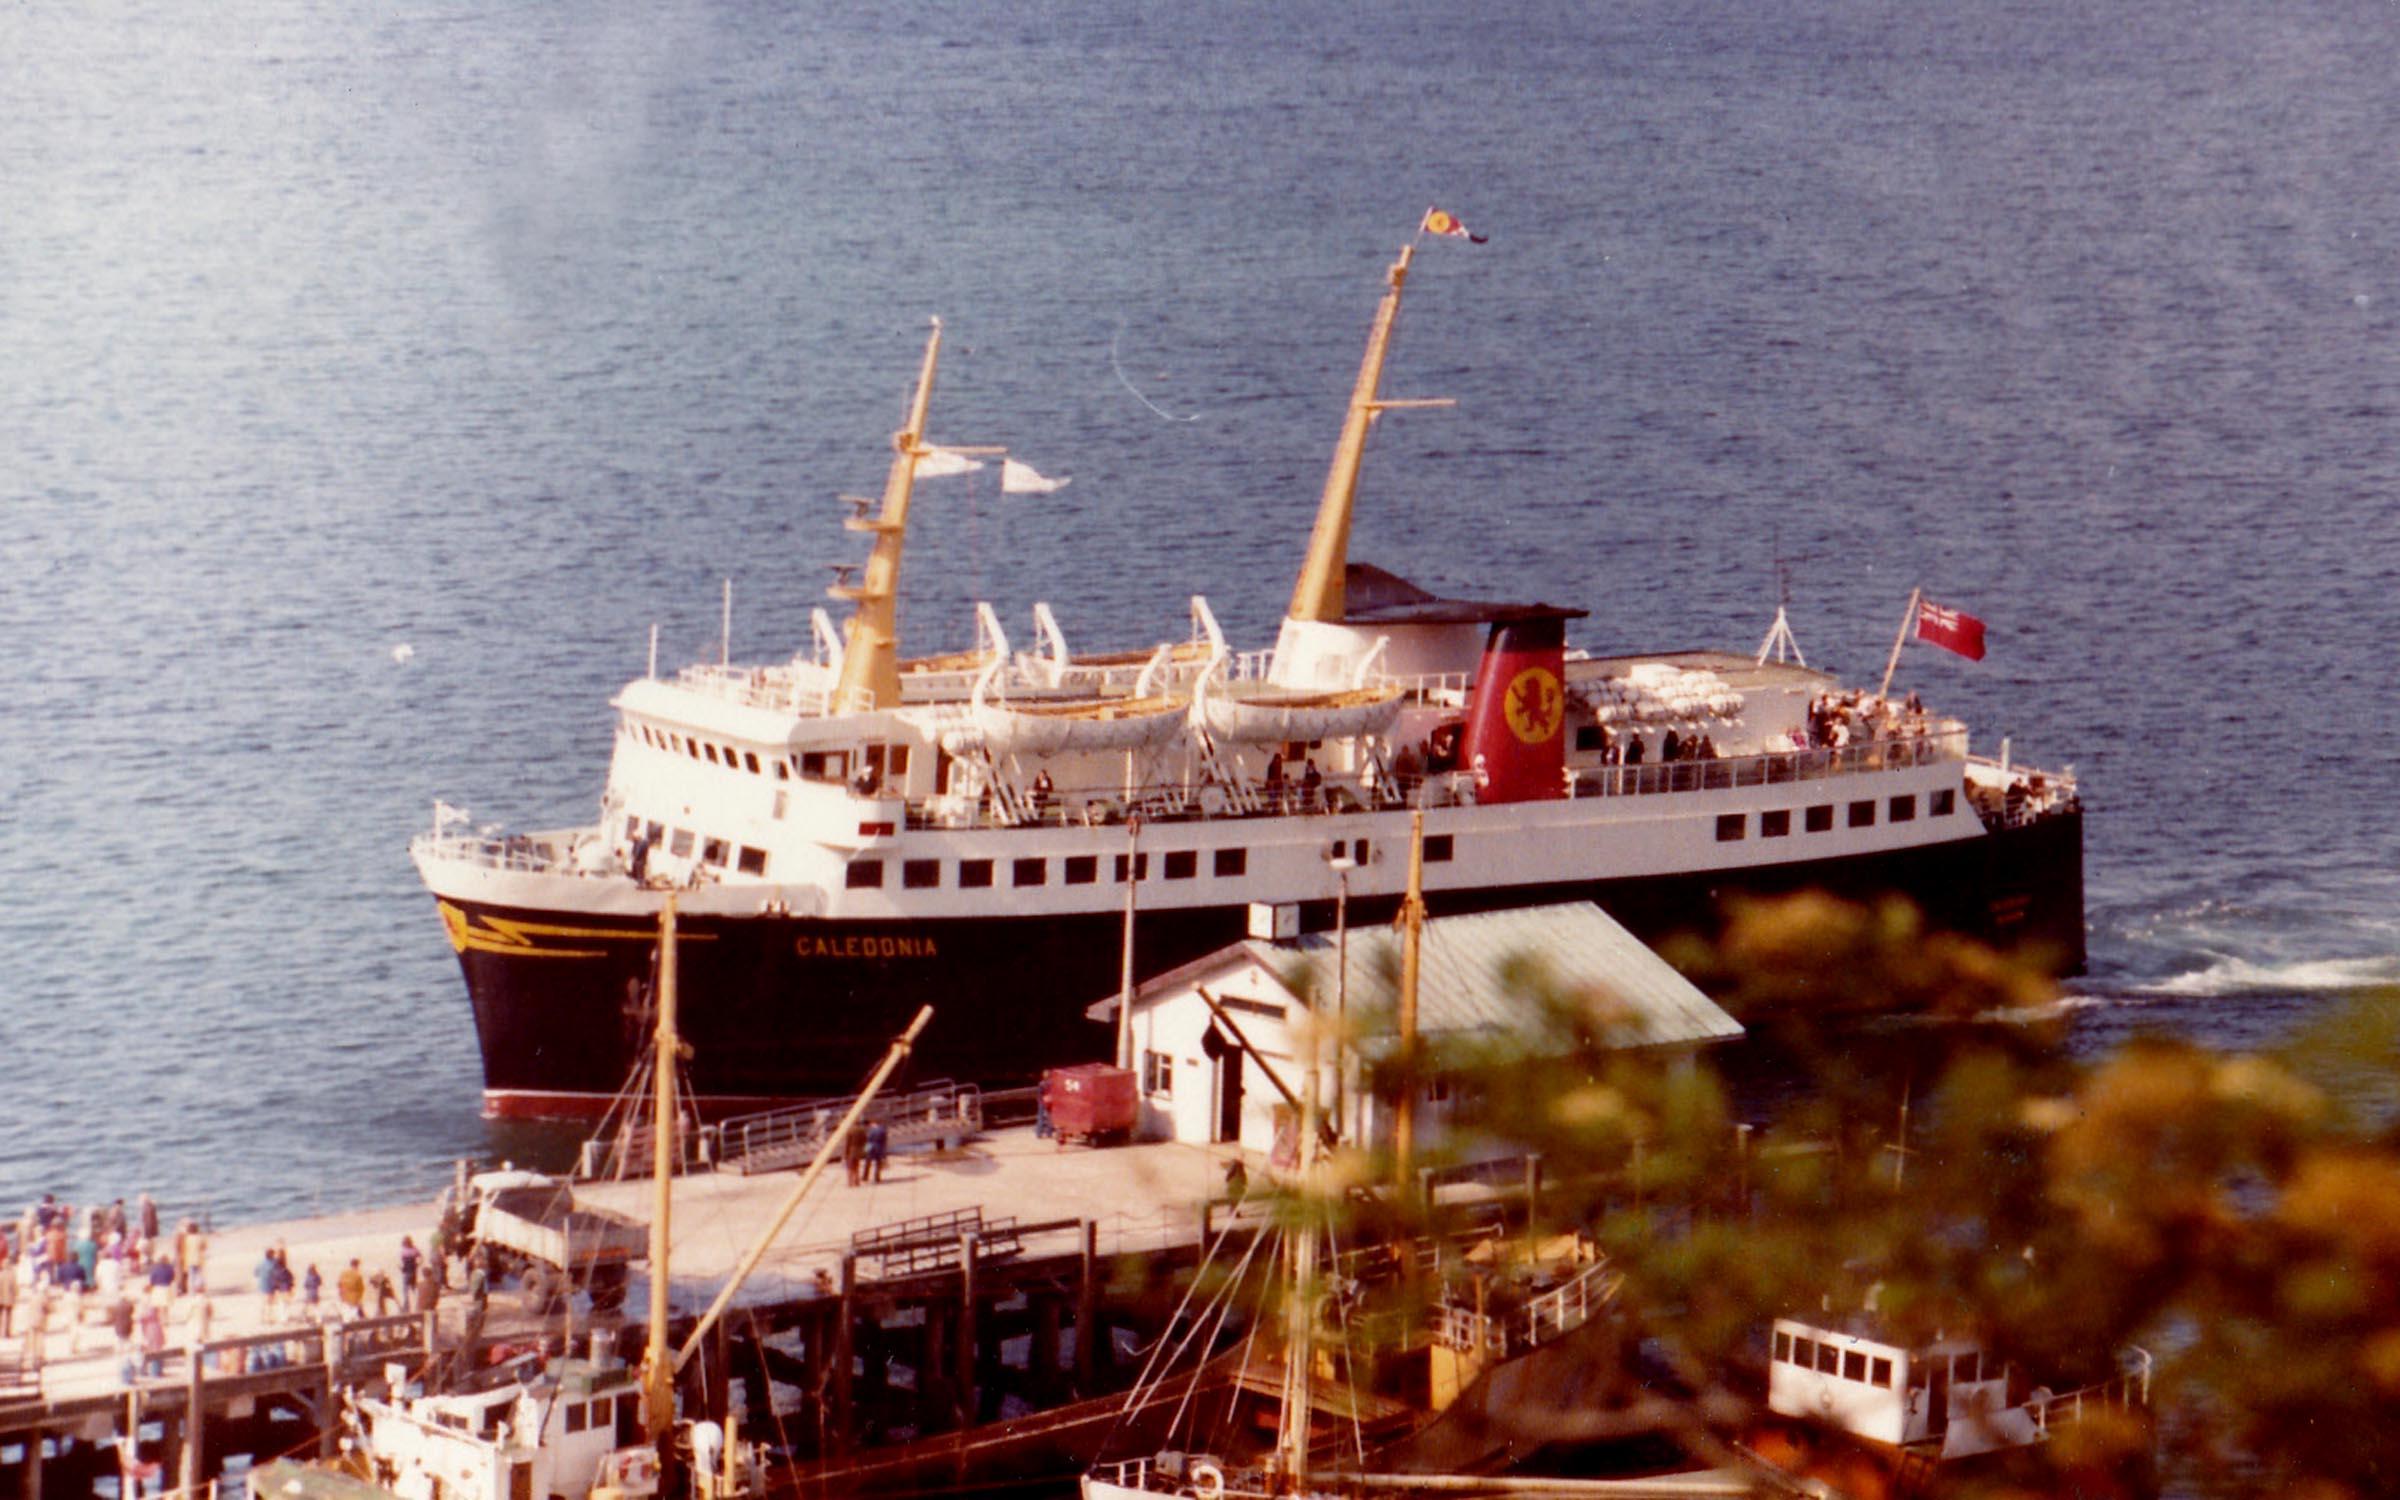 Caledonia arriving at Craignure (Jim Aikman Smith)